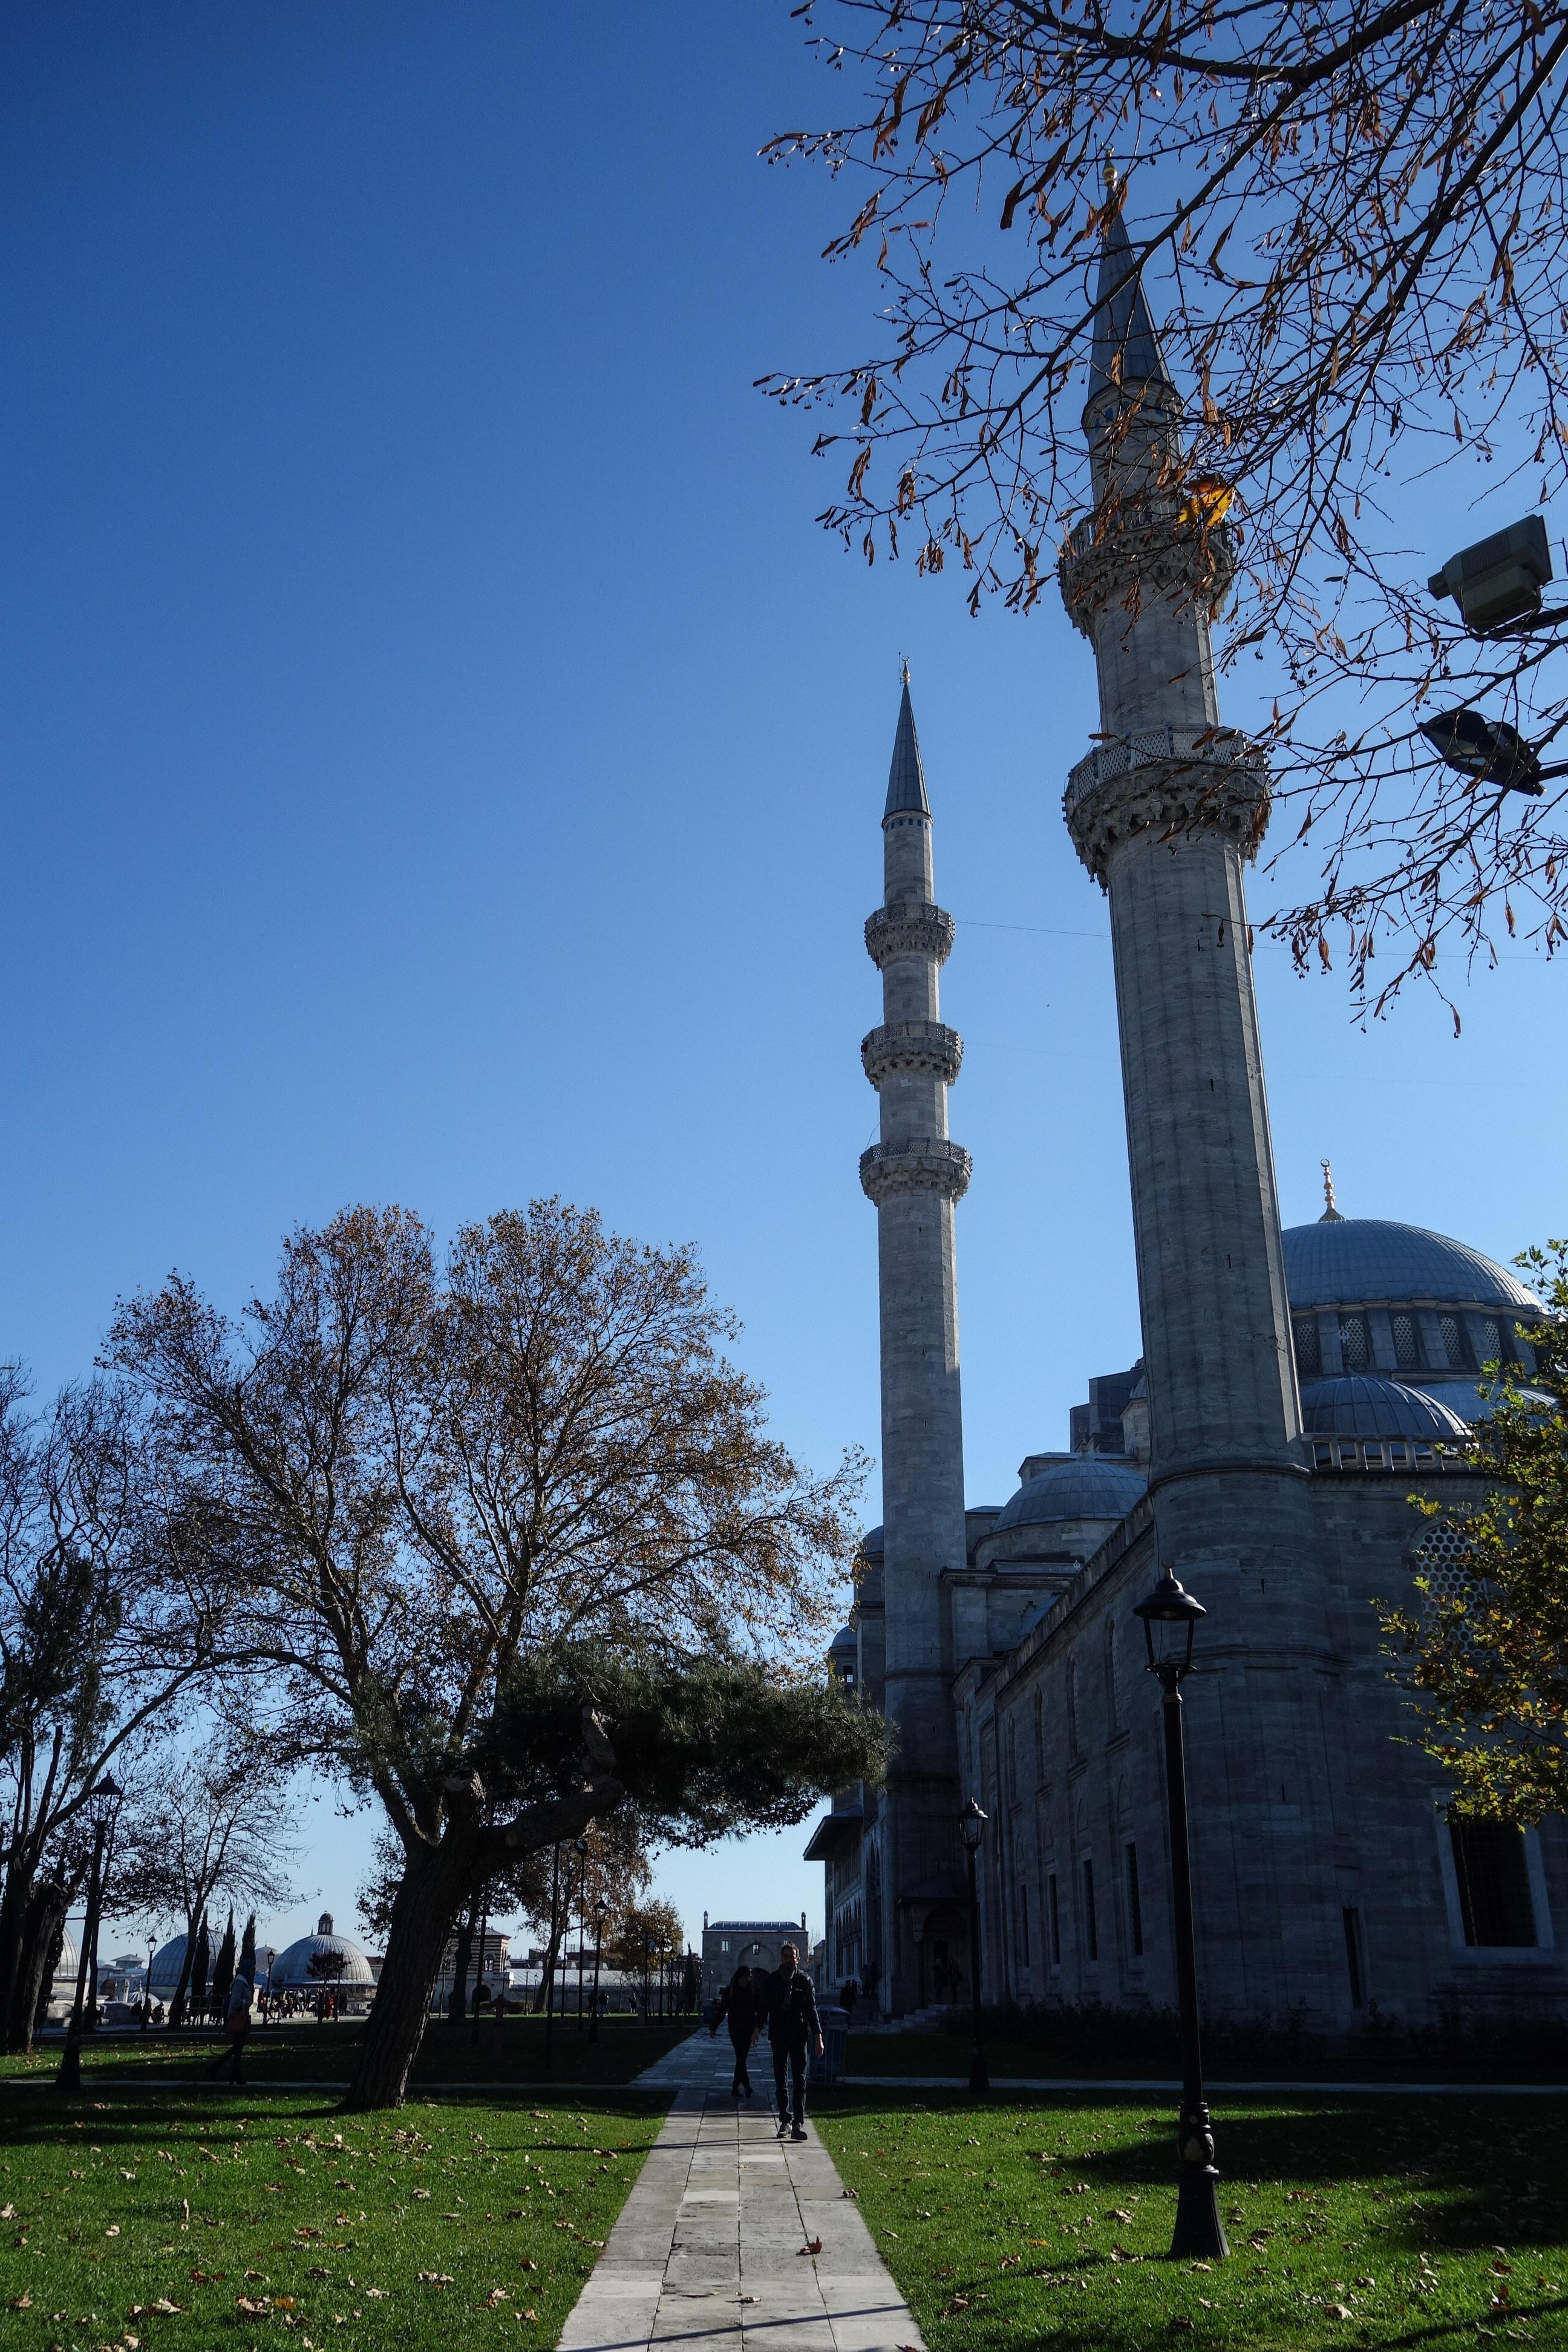 Ancora un particolare della moschea Suleymaniye